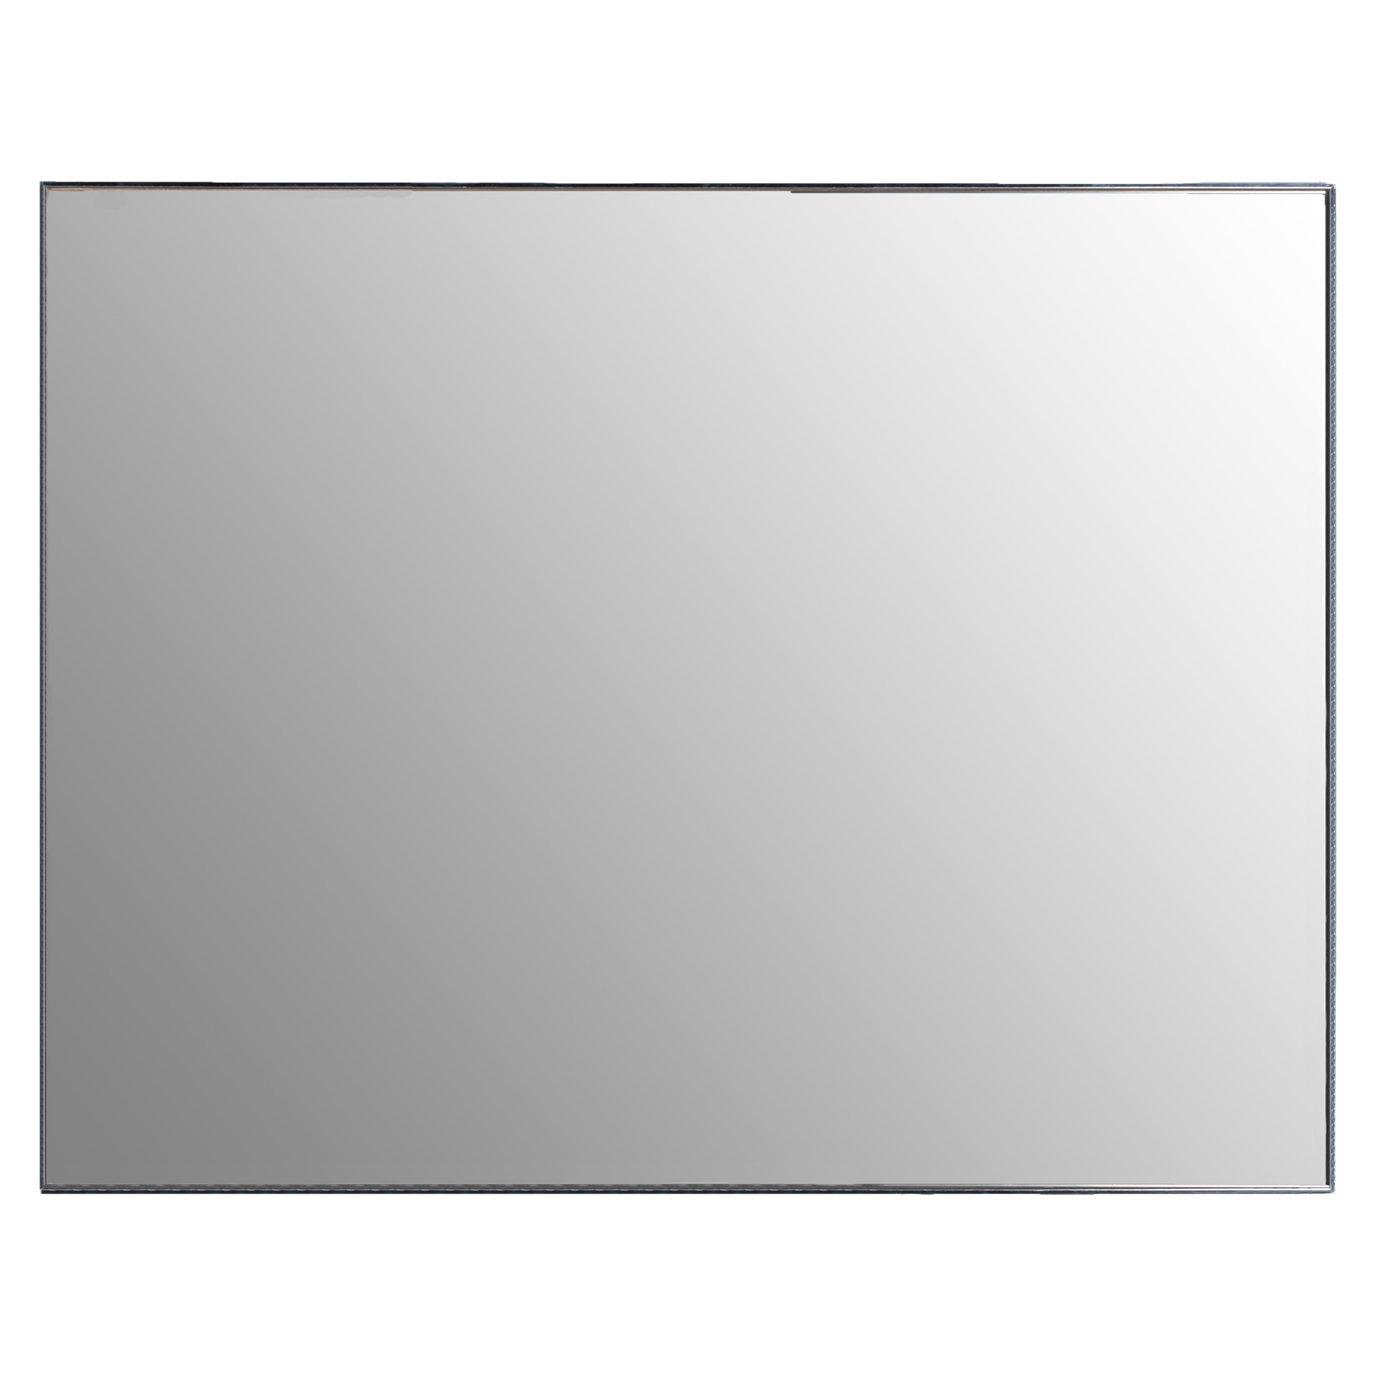 Argento 71/x 4/x 91/cm Belssia Scatola Specchio Acciaio Inox